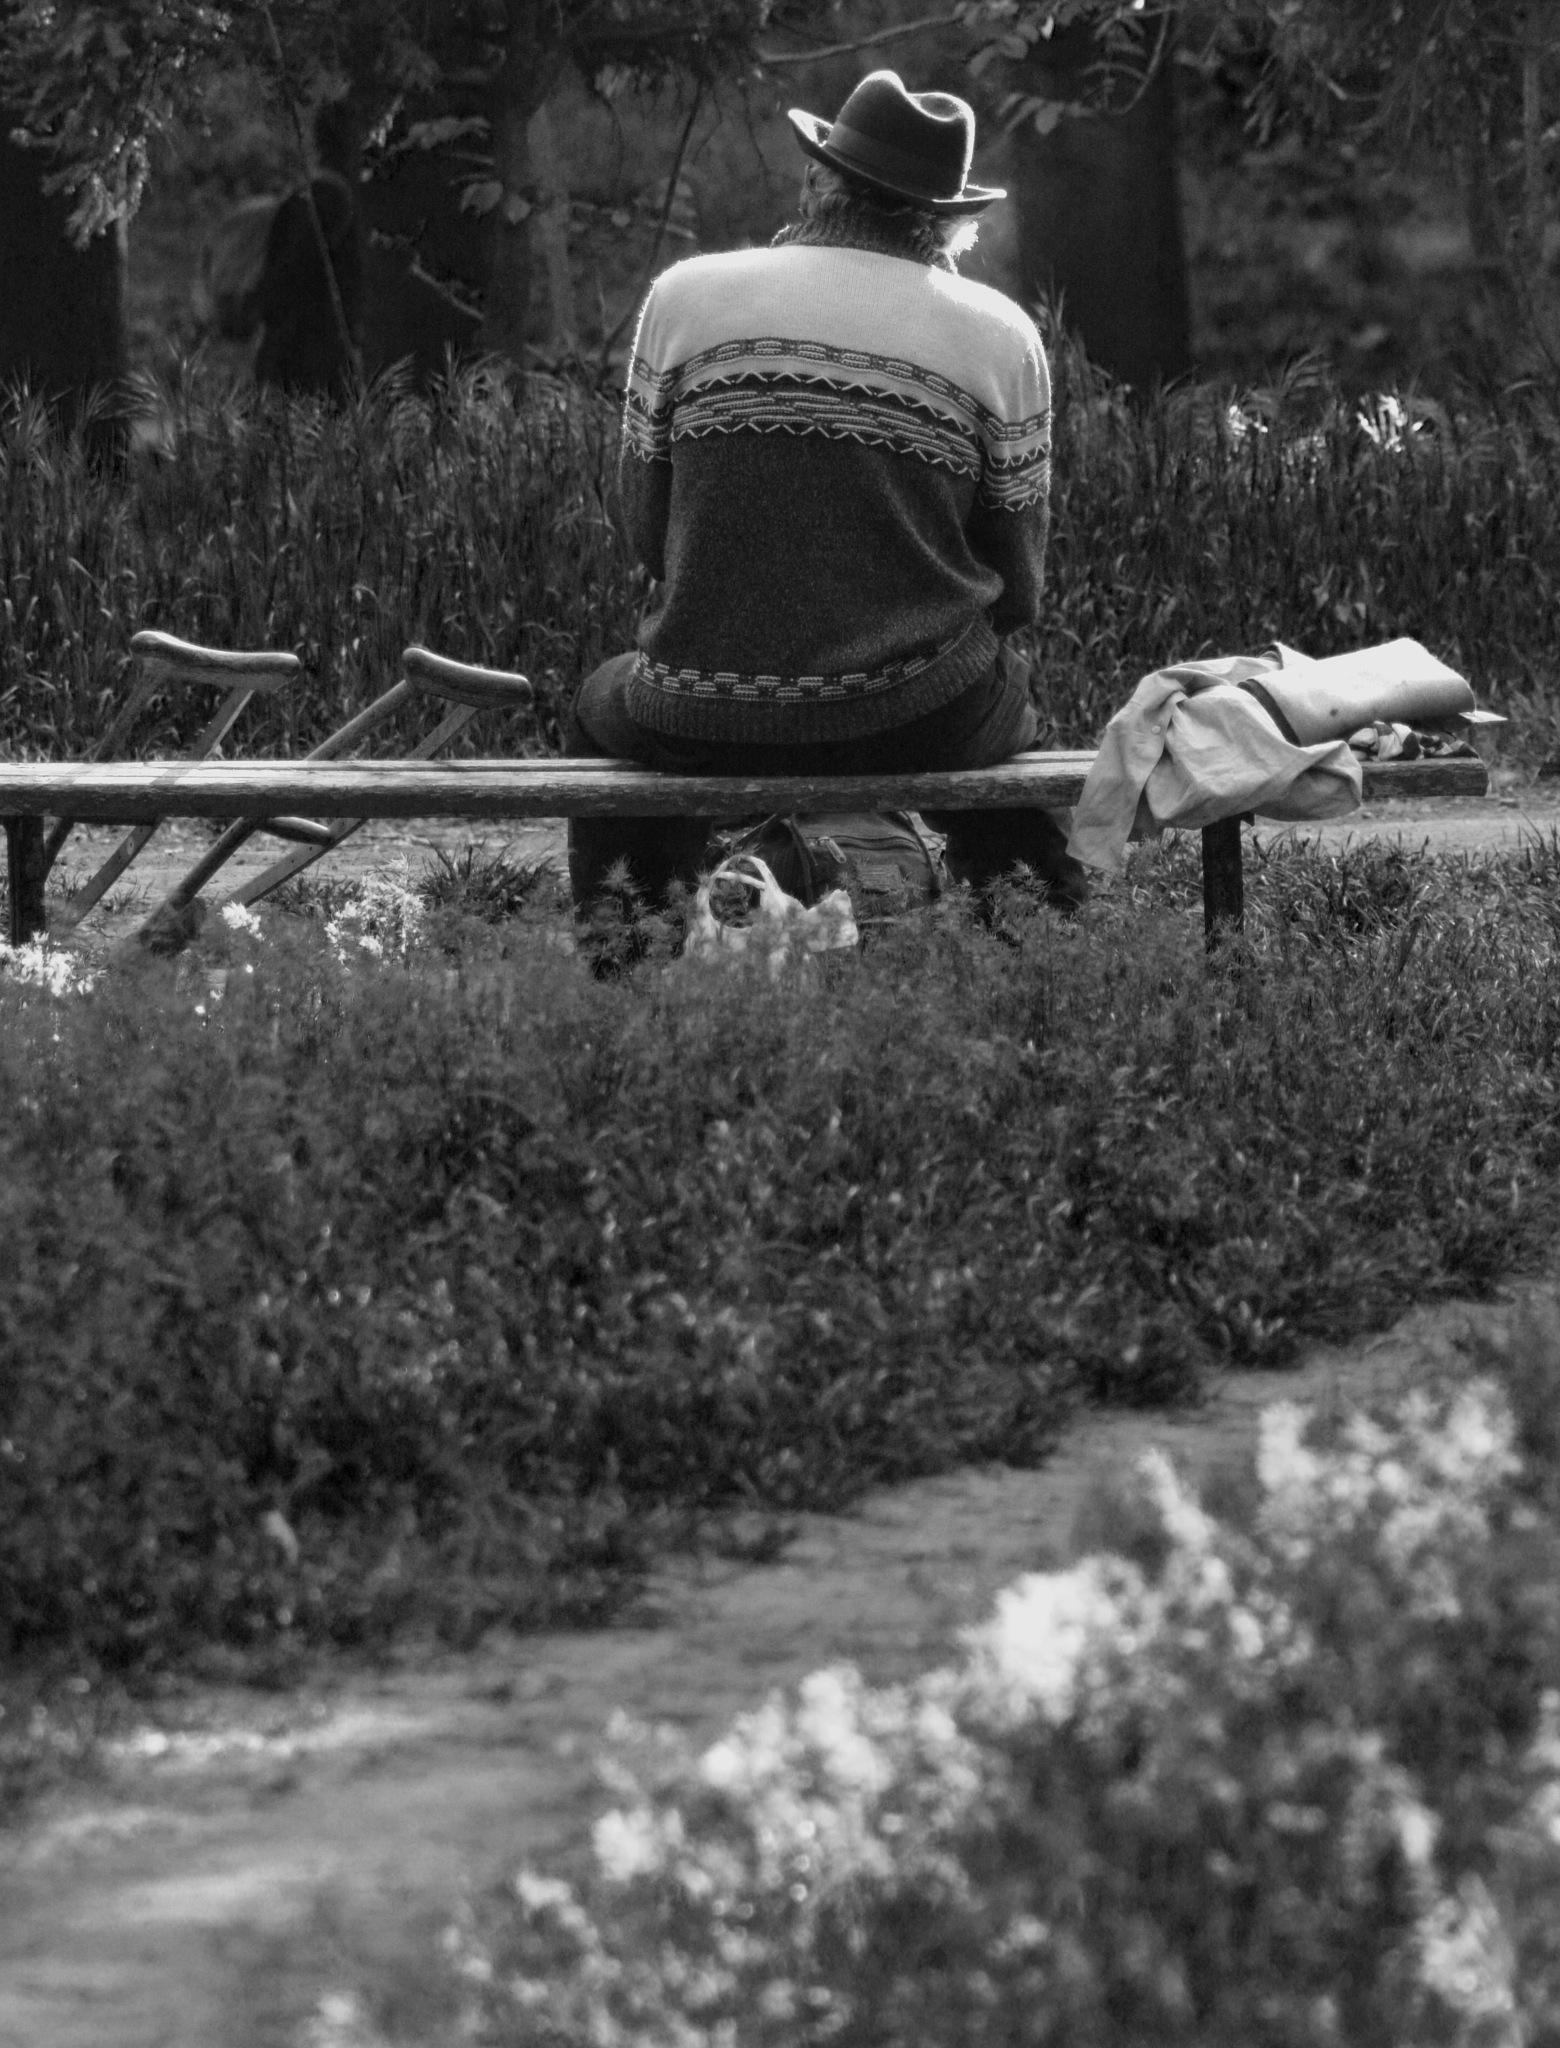 Old man on a Park Bench by Lars-Toralf Utnes Storstrand